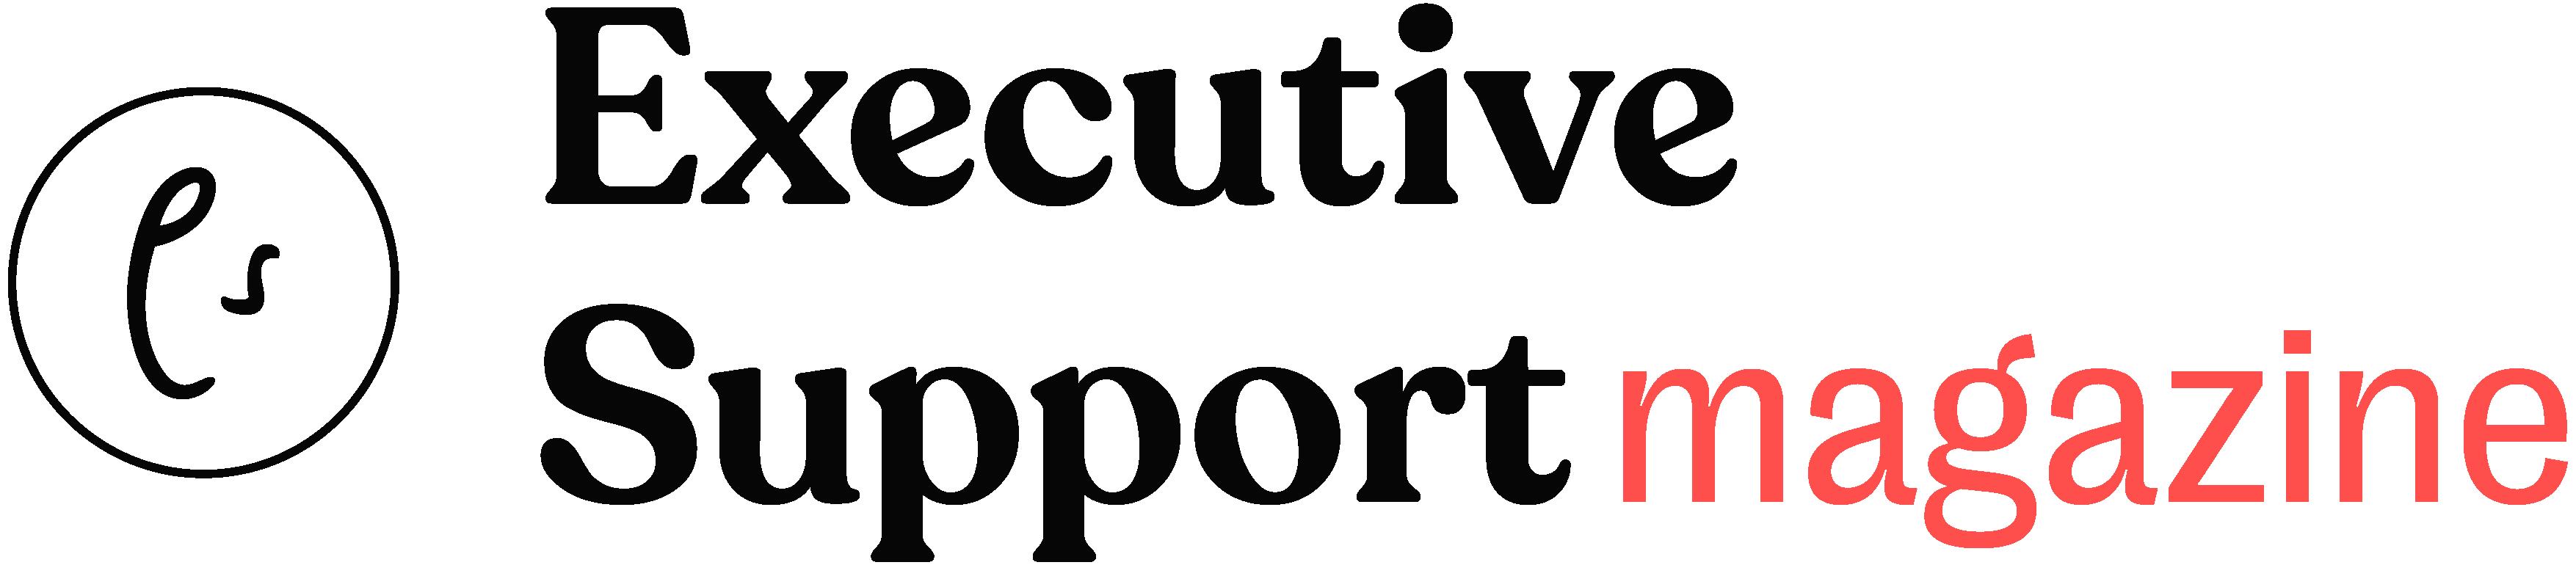 Executive Support Magazine